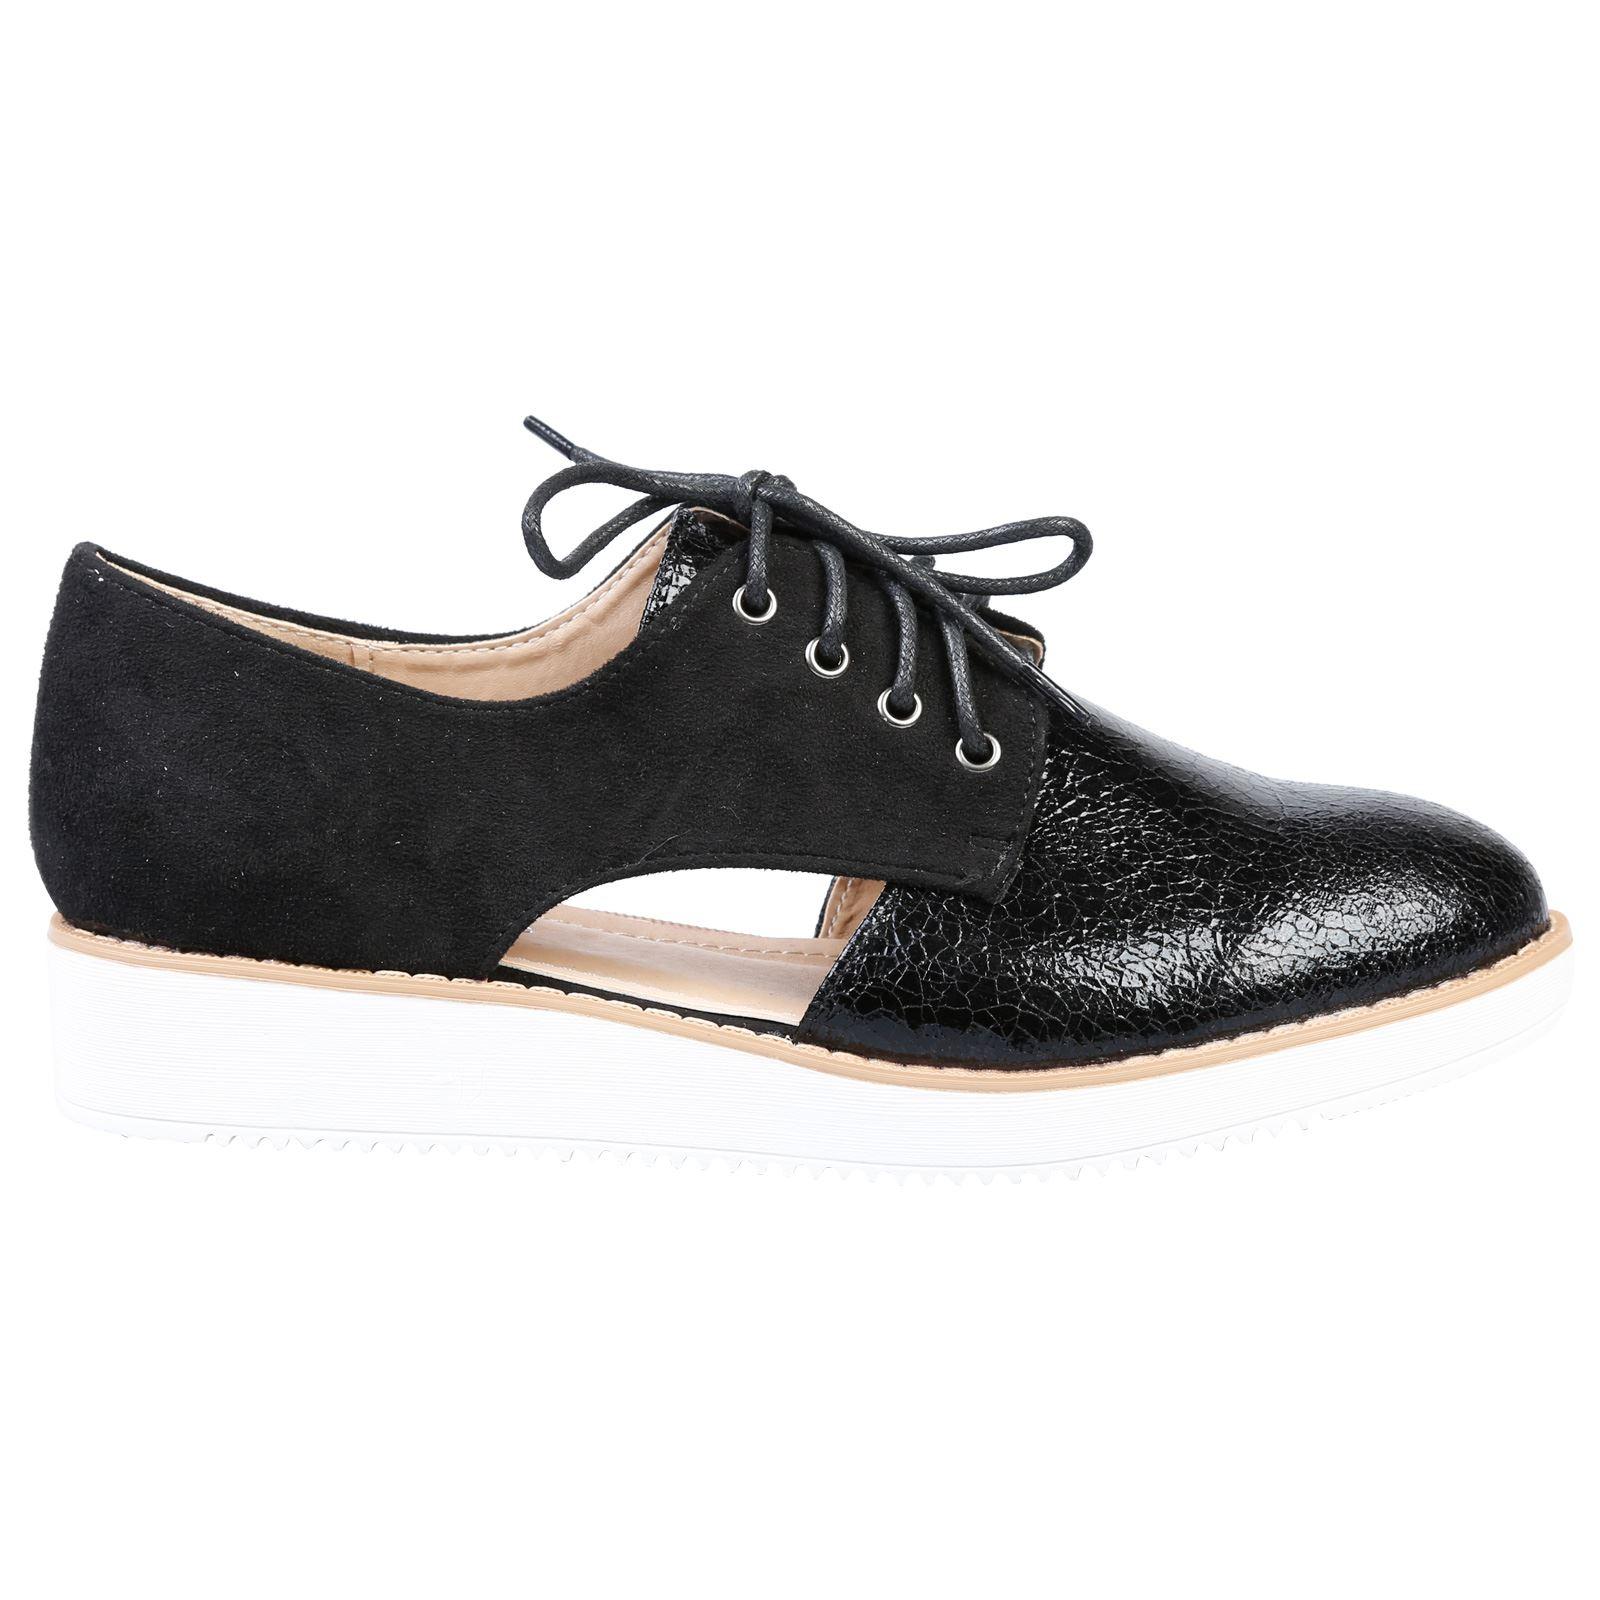 Loretta Womens Flats Low Heels Flatform Brogues Ladies Lace Up Oxford Shoes Size